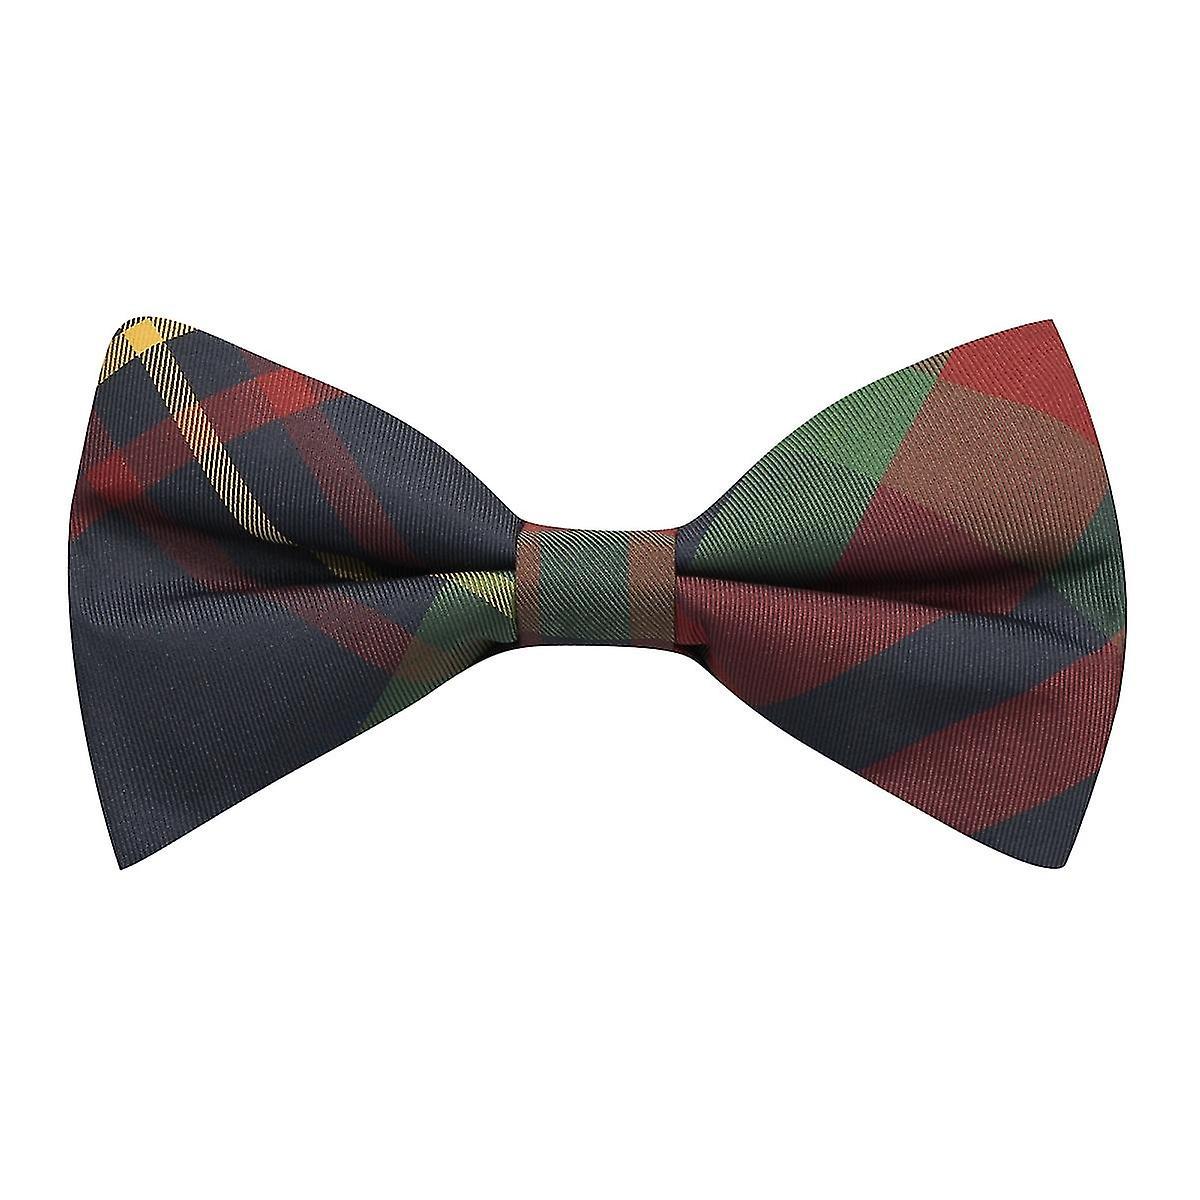 Contemporary Red / Blue Tartan Plaid Check Bow Tie